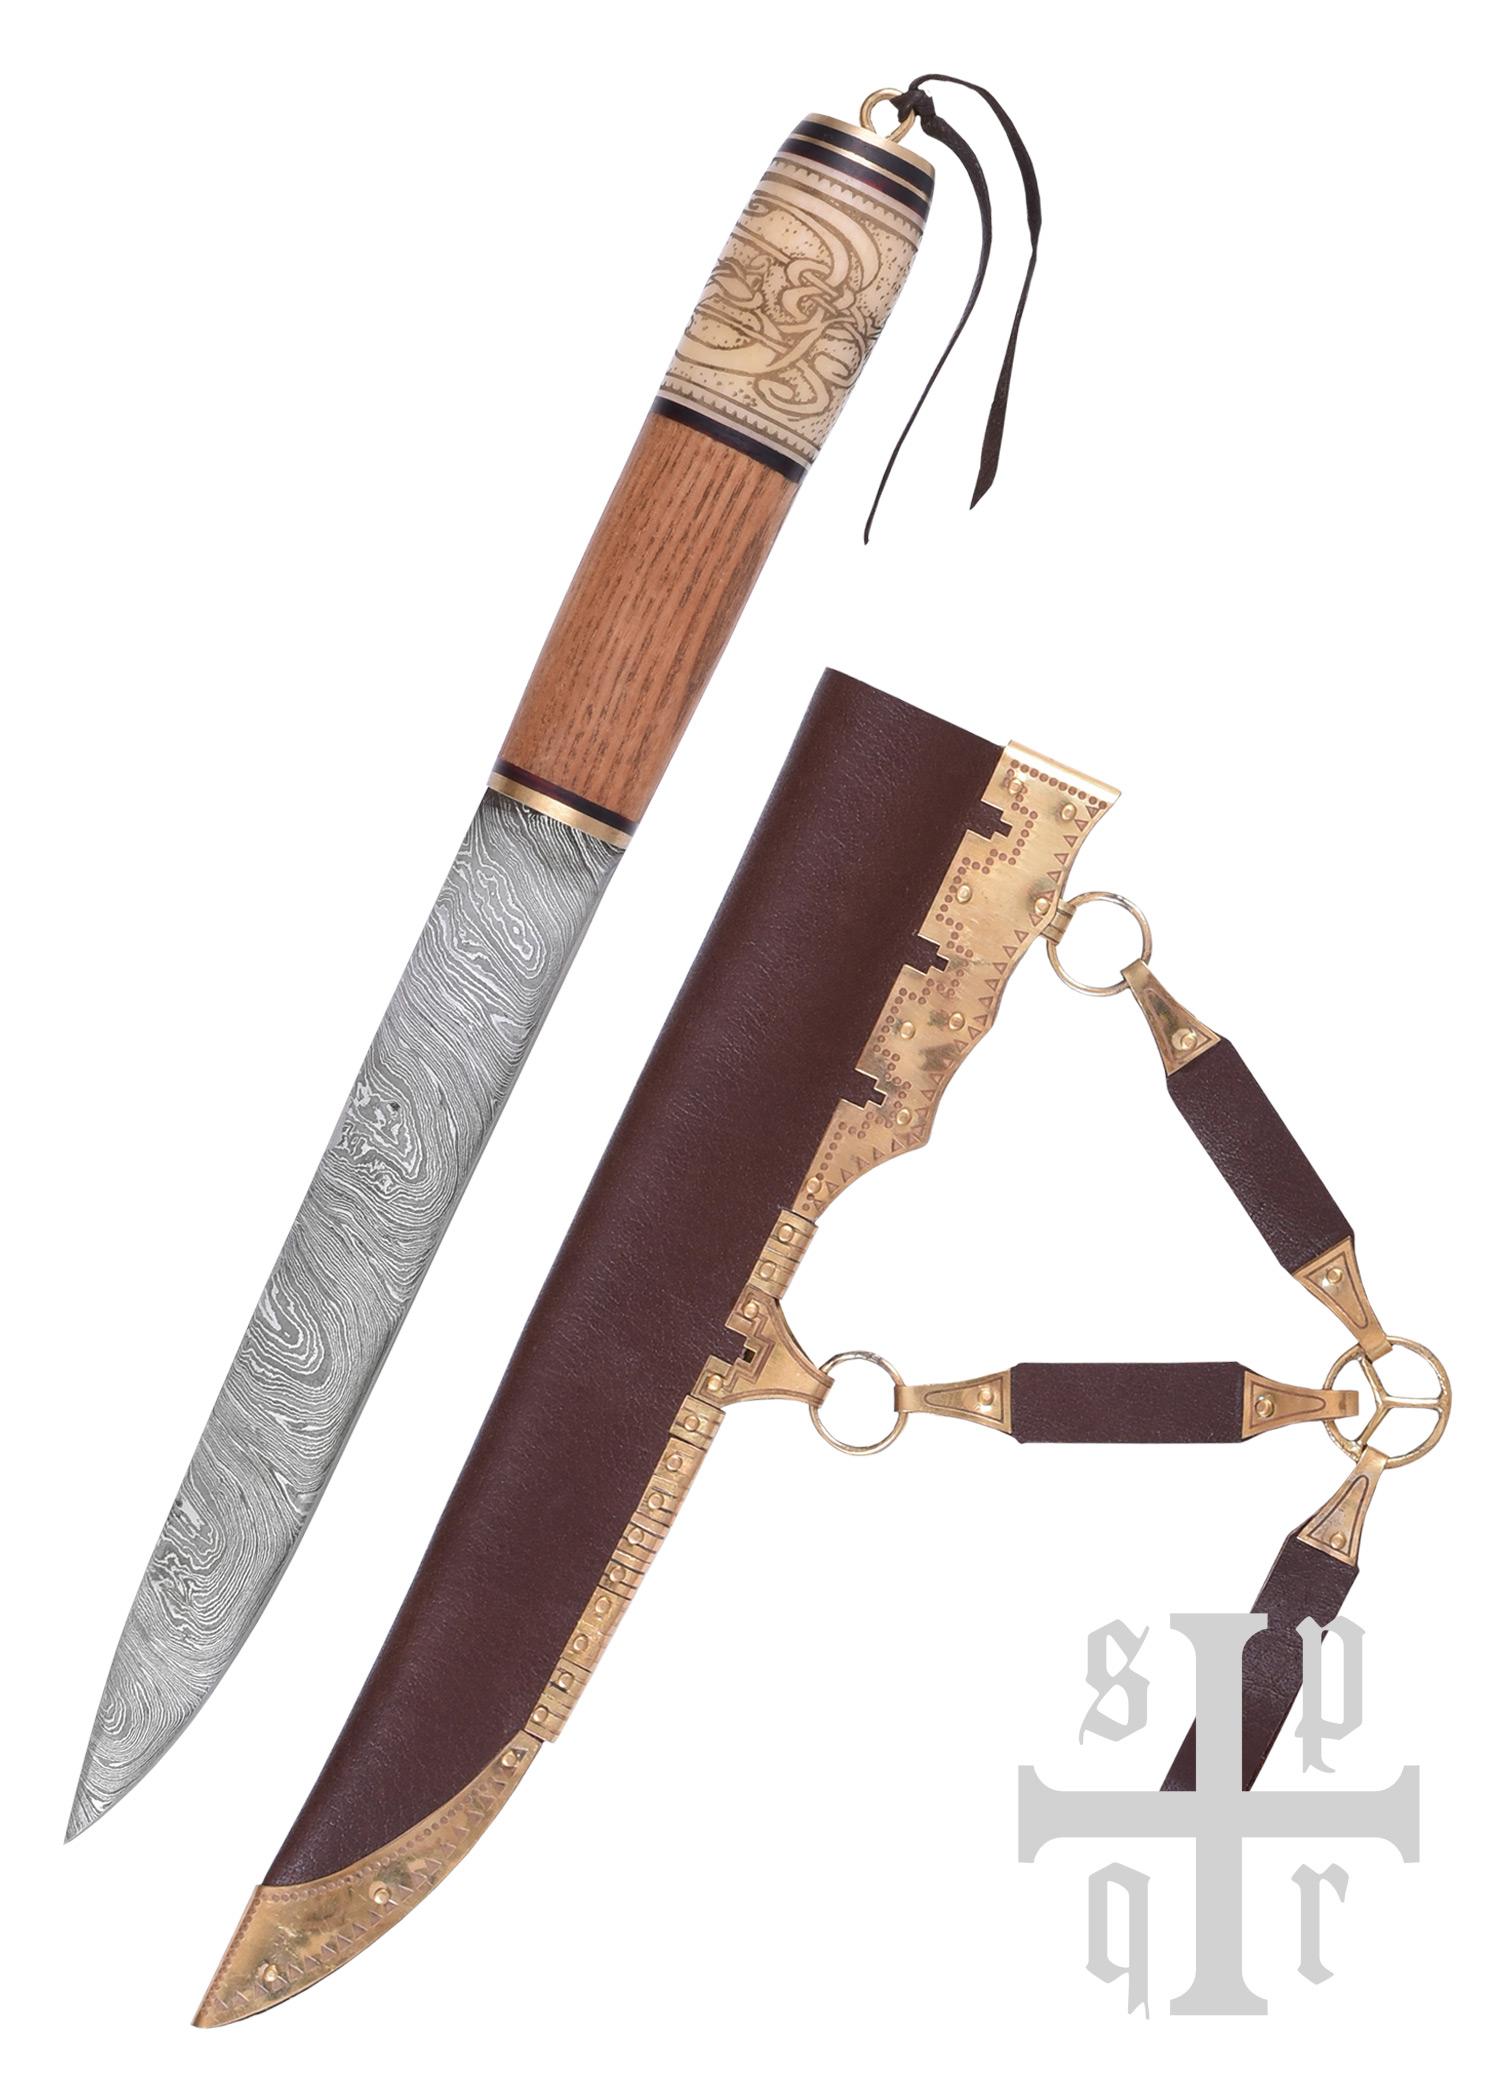 Wikinger-Messer, Damaststahl, Holz-/Knochengriff m. Knotenmuster